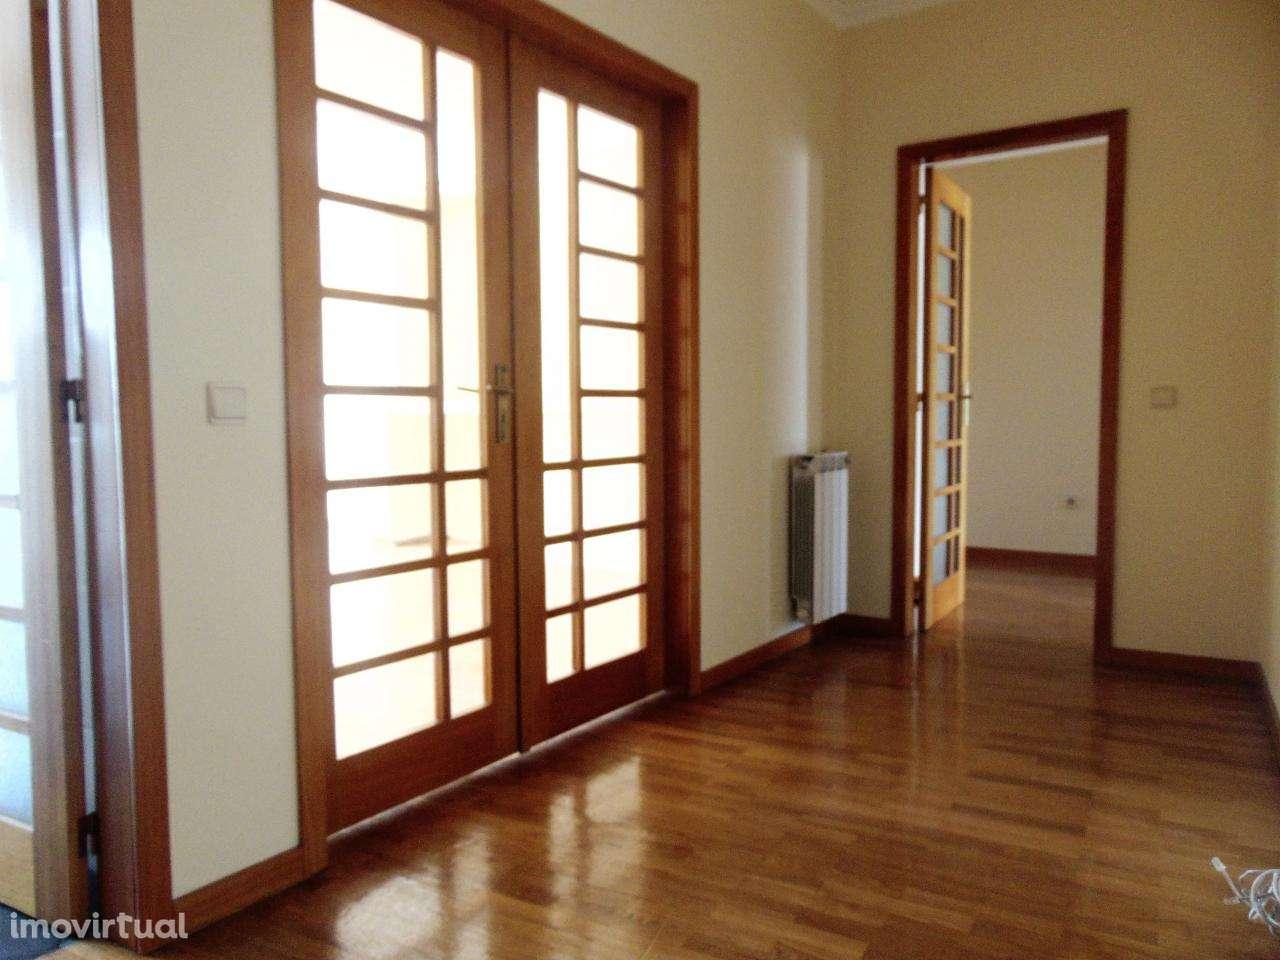 Apartamento para comprar, Vila Nova de Famalicão e Calendário, Vila Nova de Famalicão, Braga - Foto 10